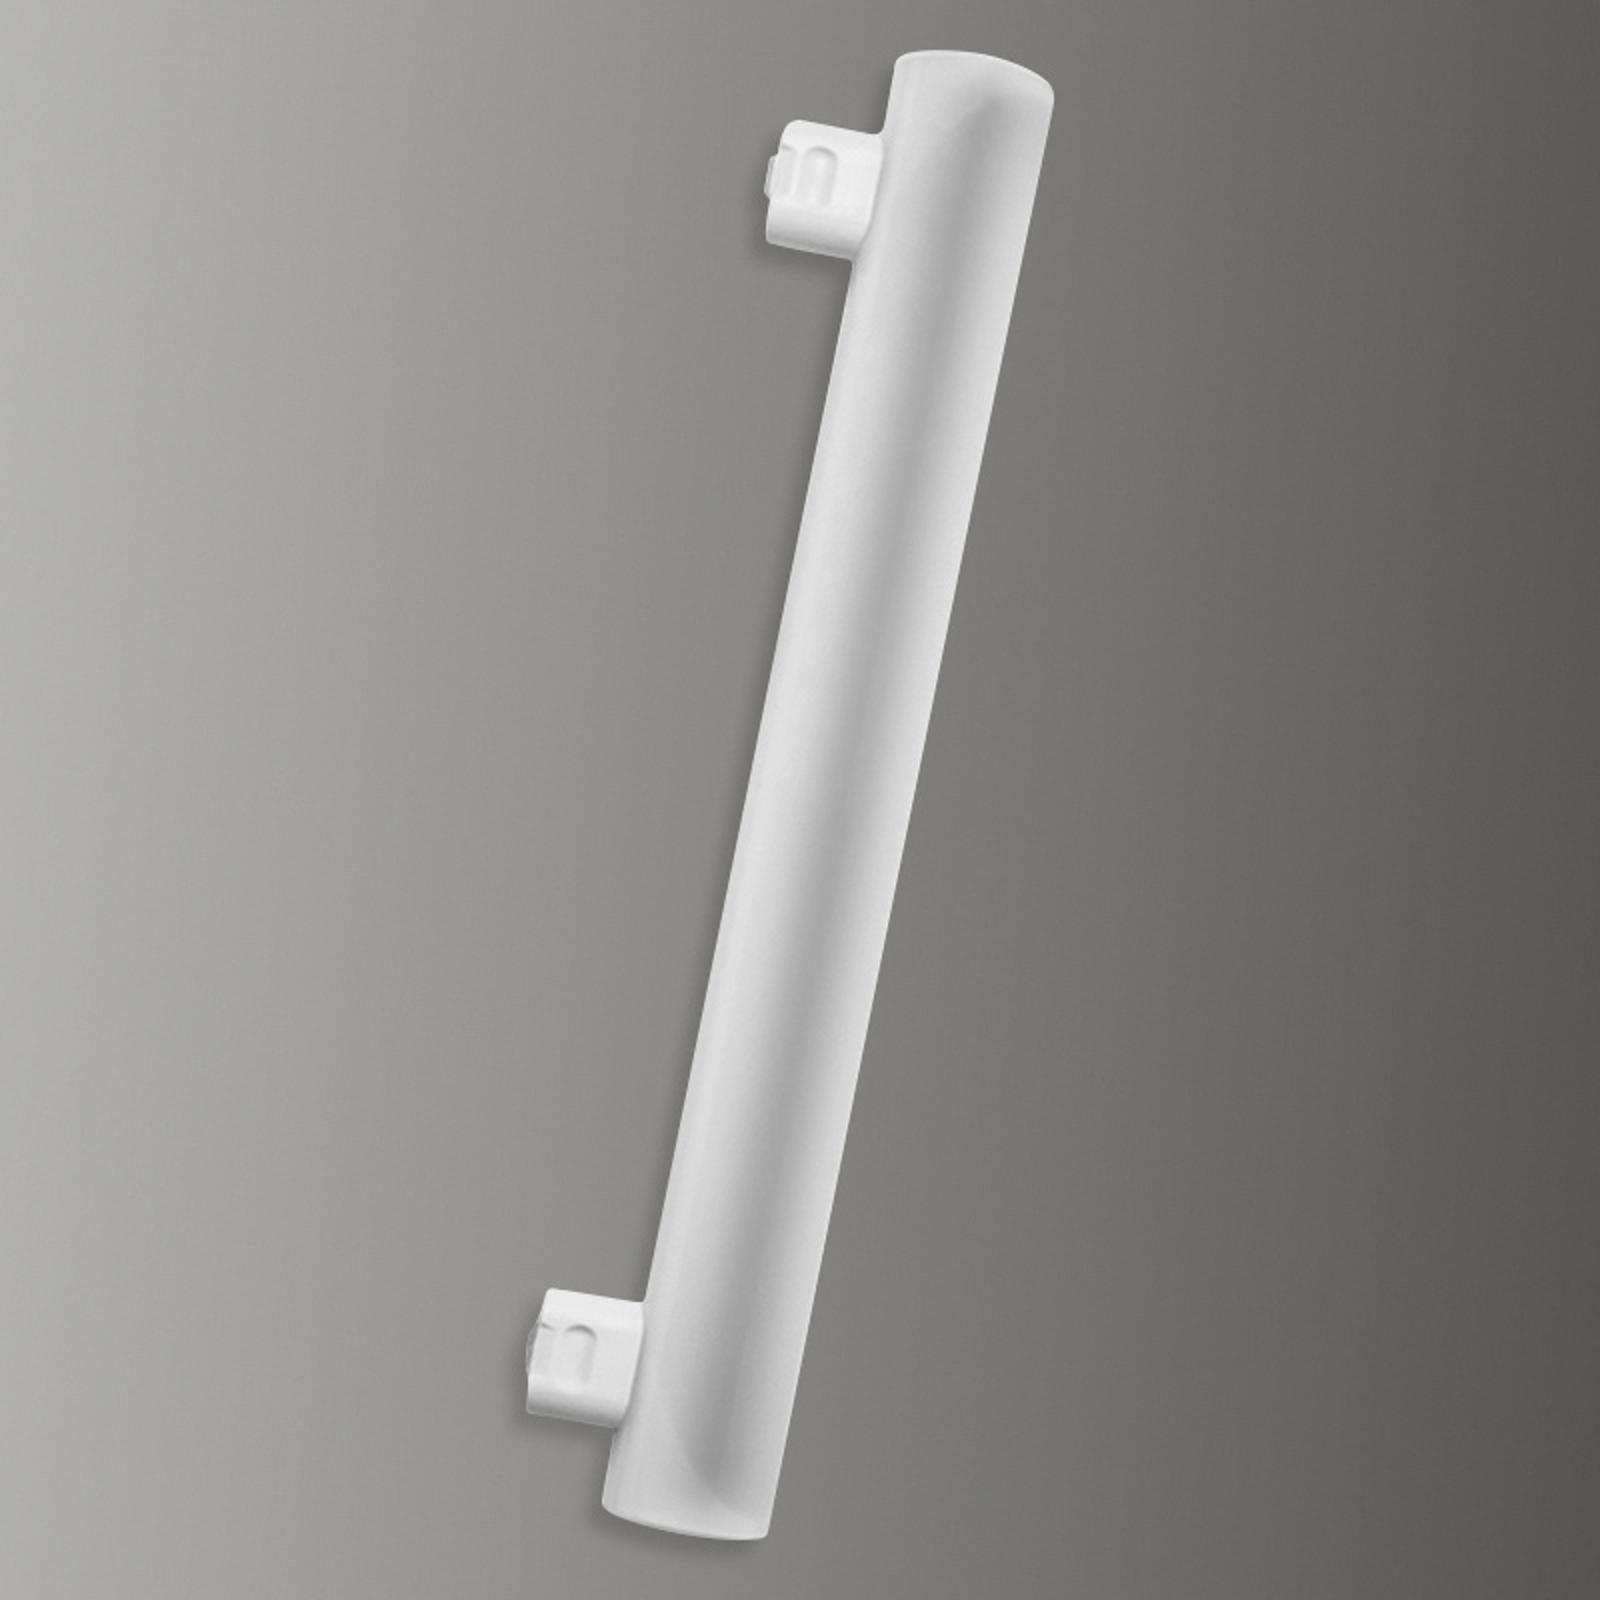 Tubo a LED S14s 4W 827, 2 zoccoli, 300 mm